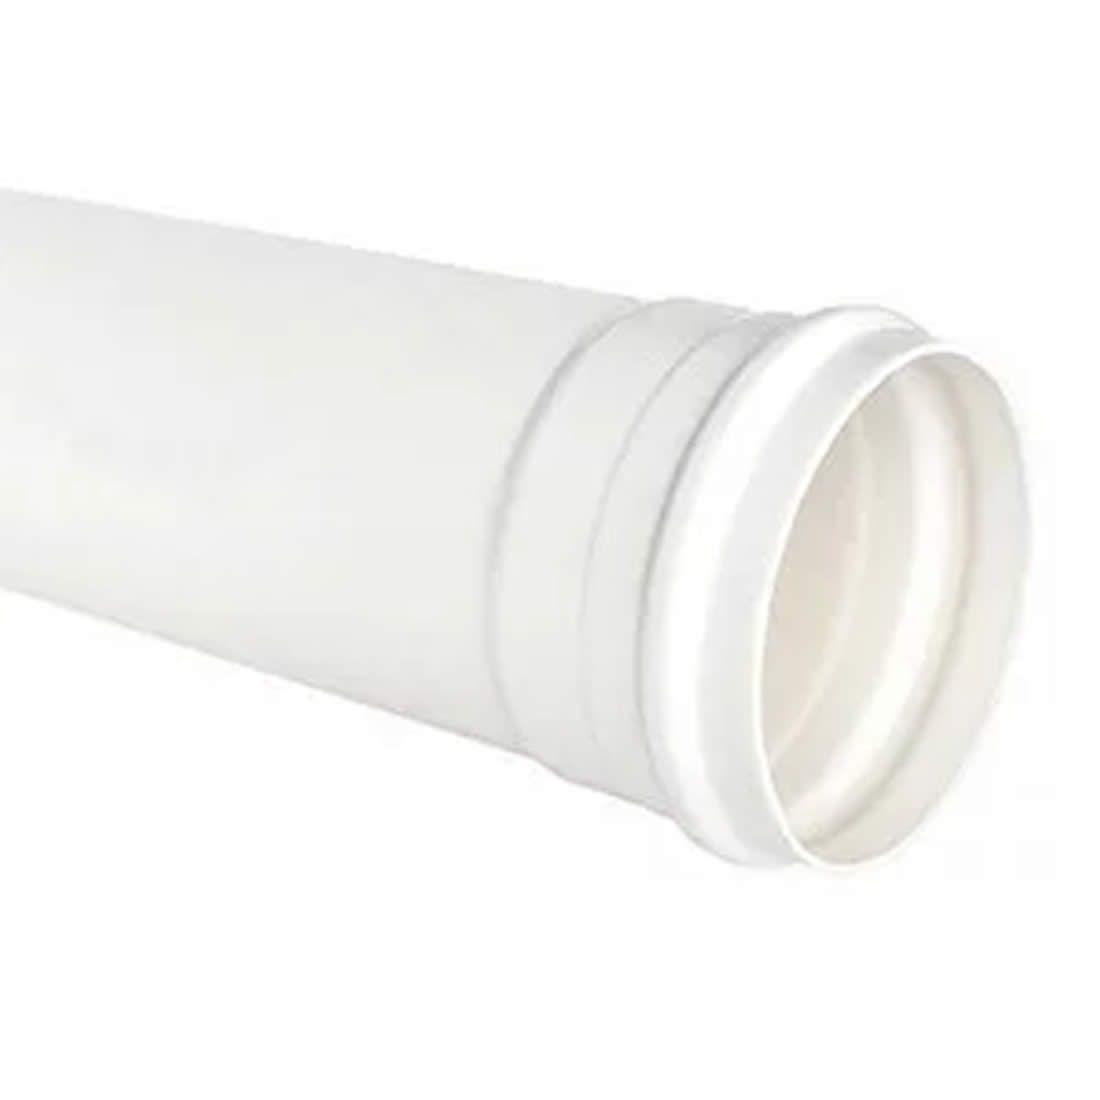 Tubo PVC Para Esgoto 100mm X 6 Metros Tigre